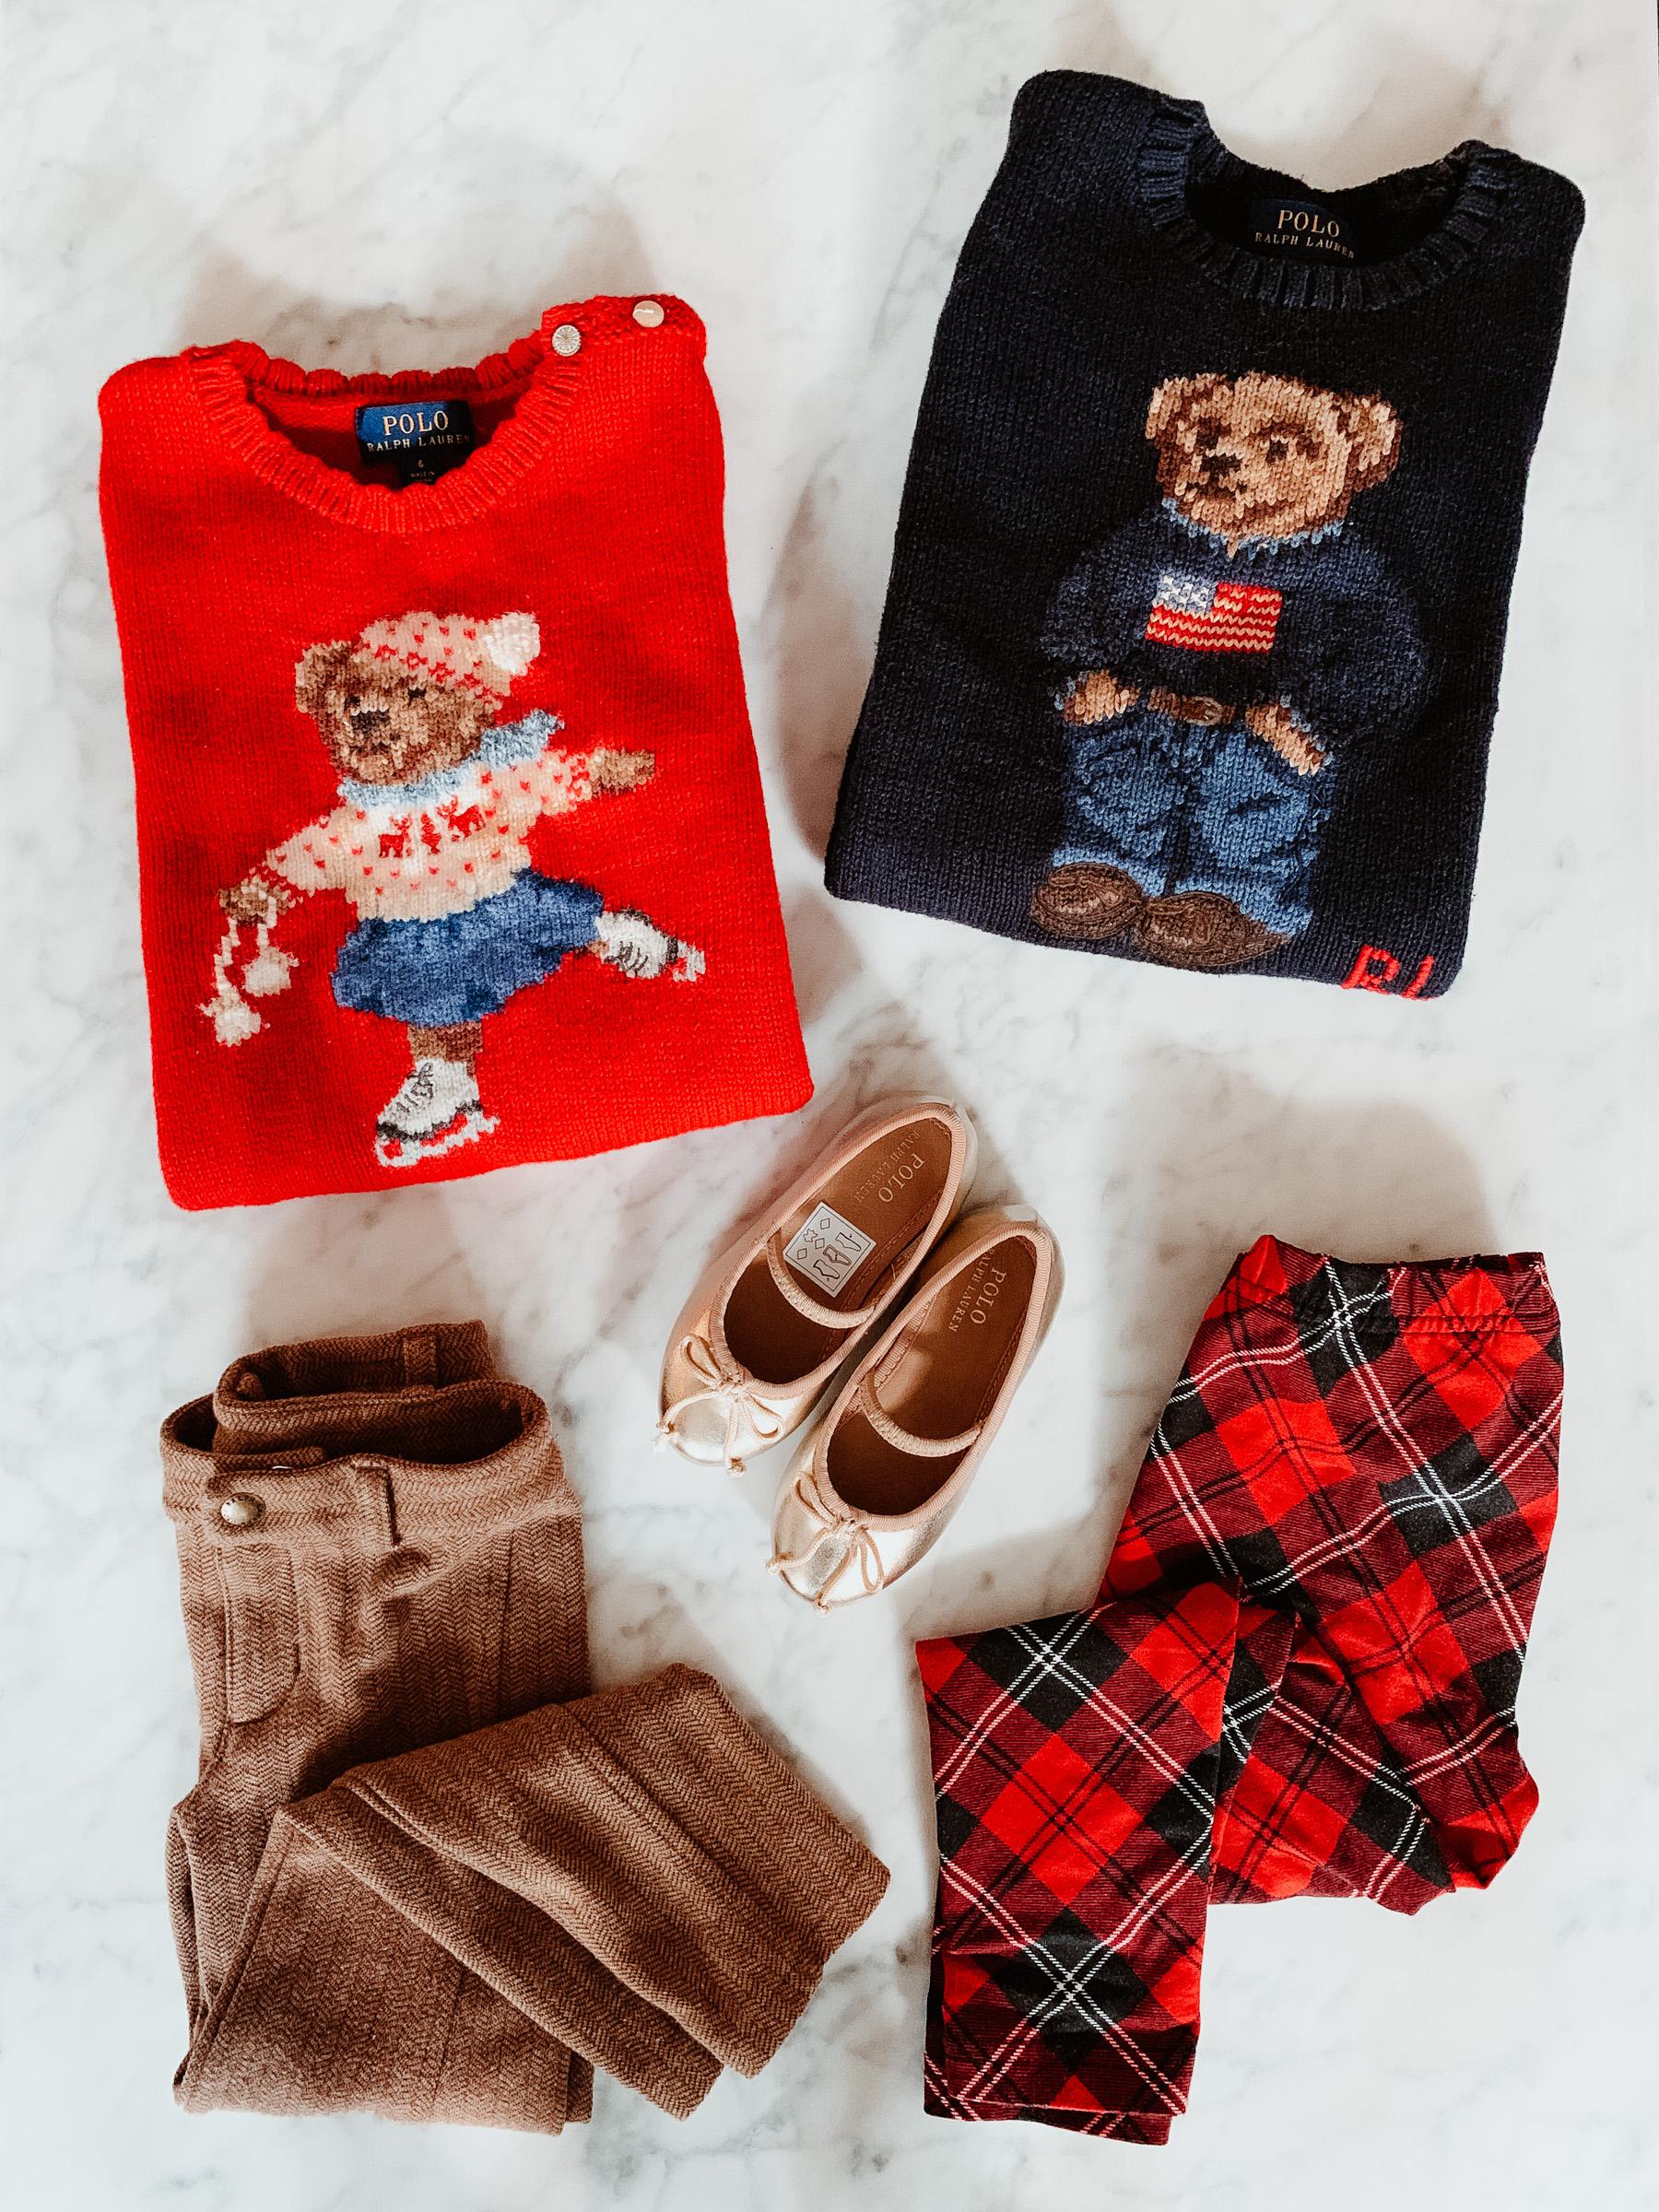 478196a2a46 Ice Skating Bear Sweater   Gold Flats   Polo Bear Sweater   Herringbone  Leggings   Tartan Leggings all c o